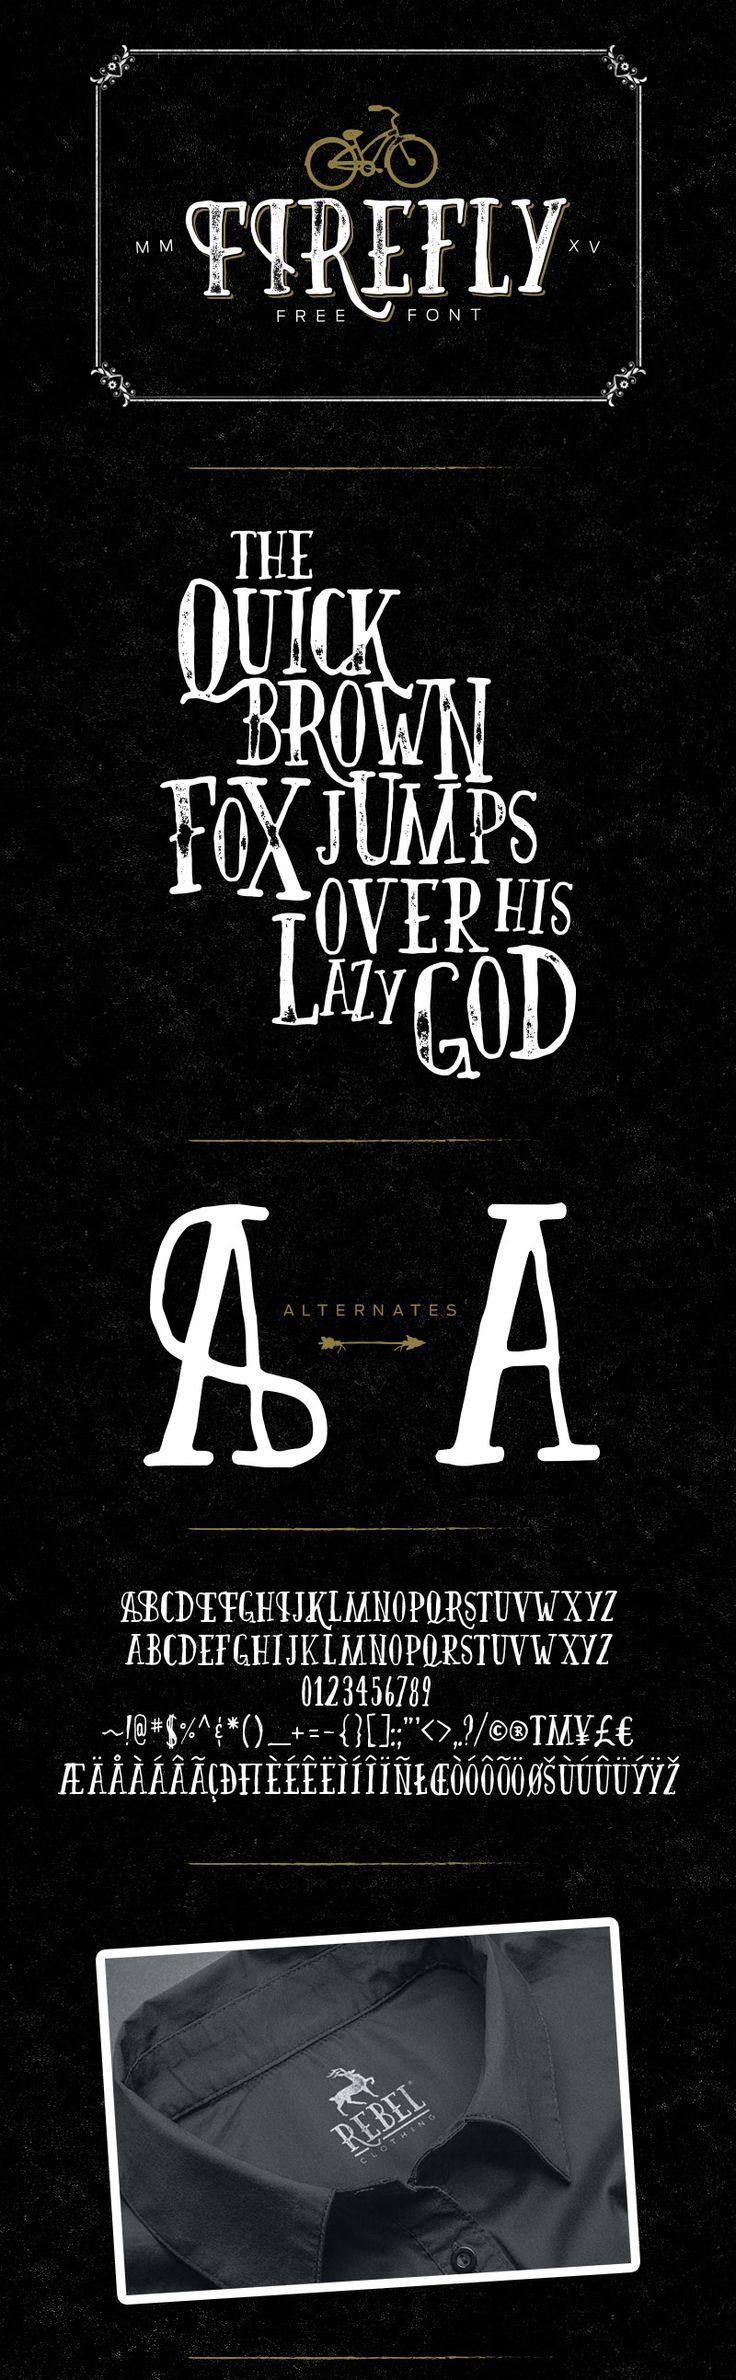 Drawn typeface amazing writing Font 25+ on Hand Pinterest